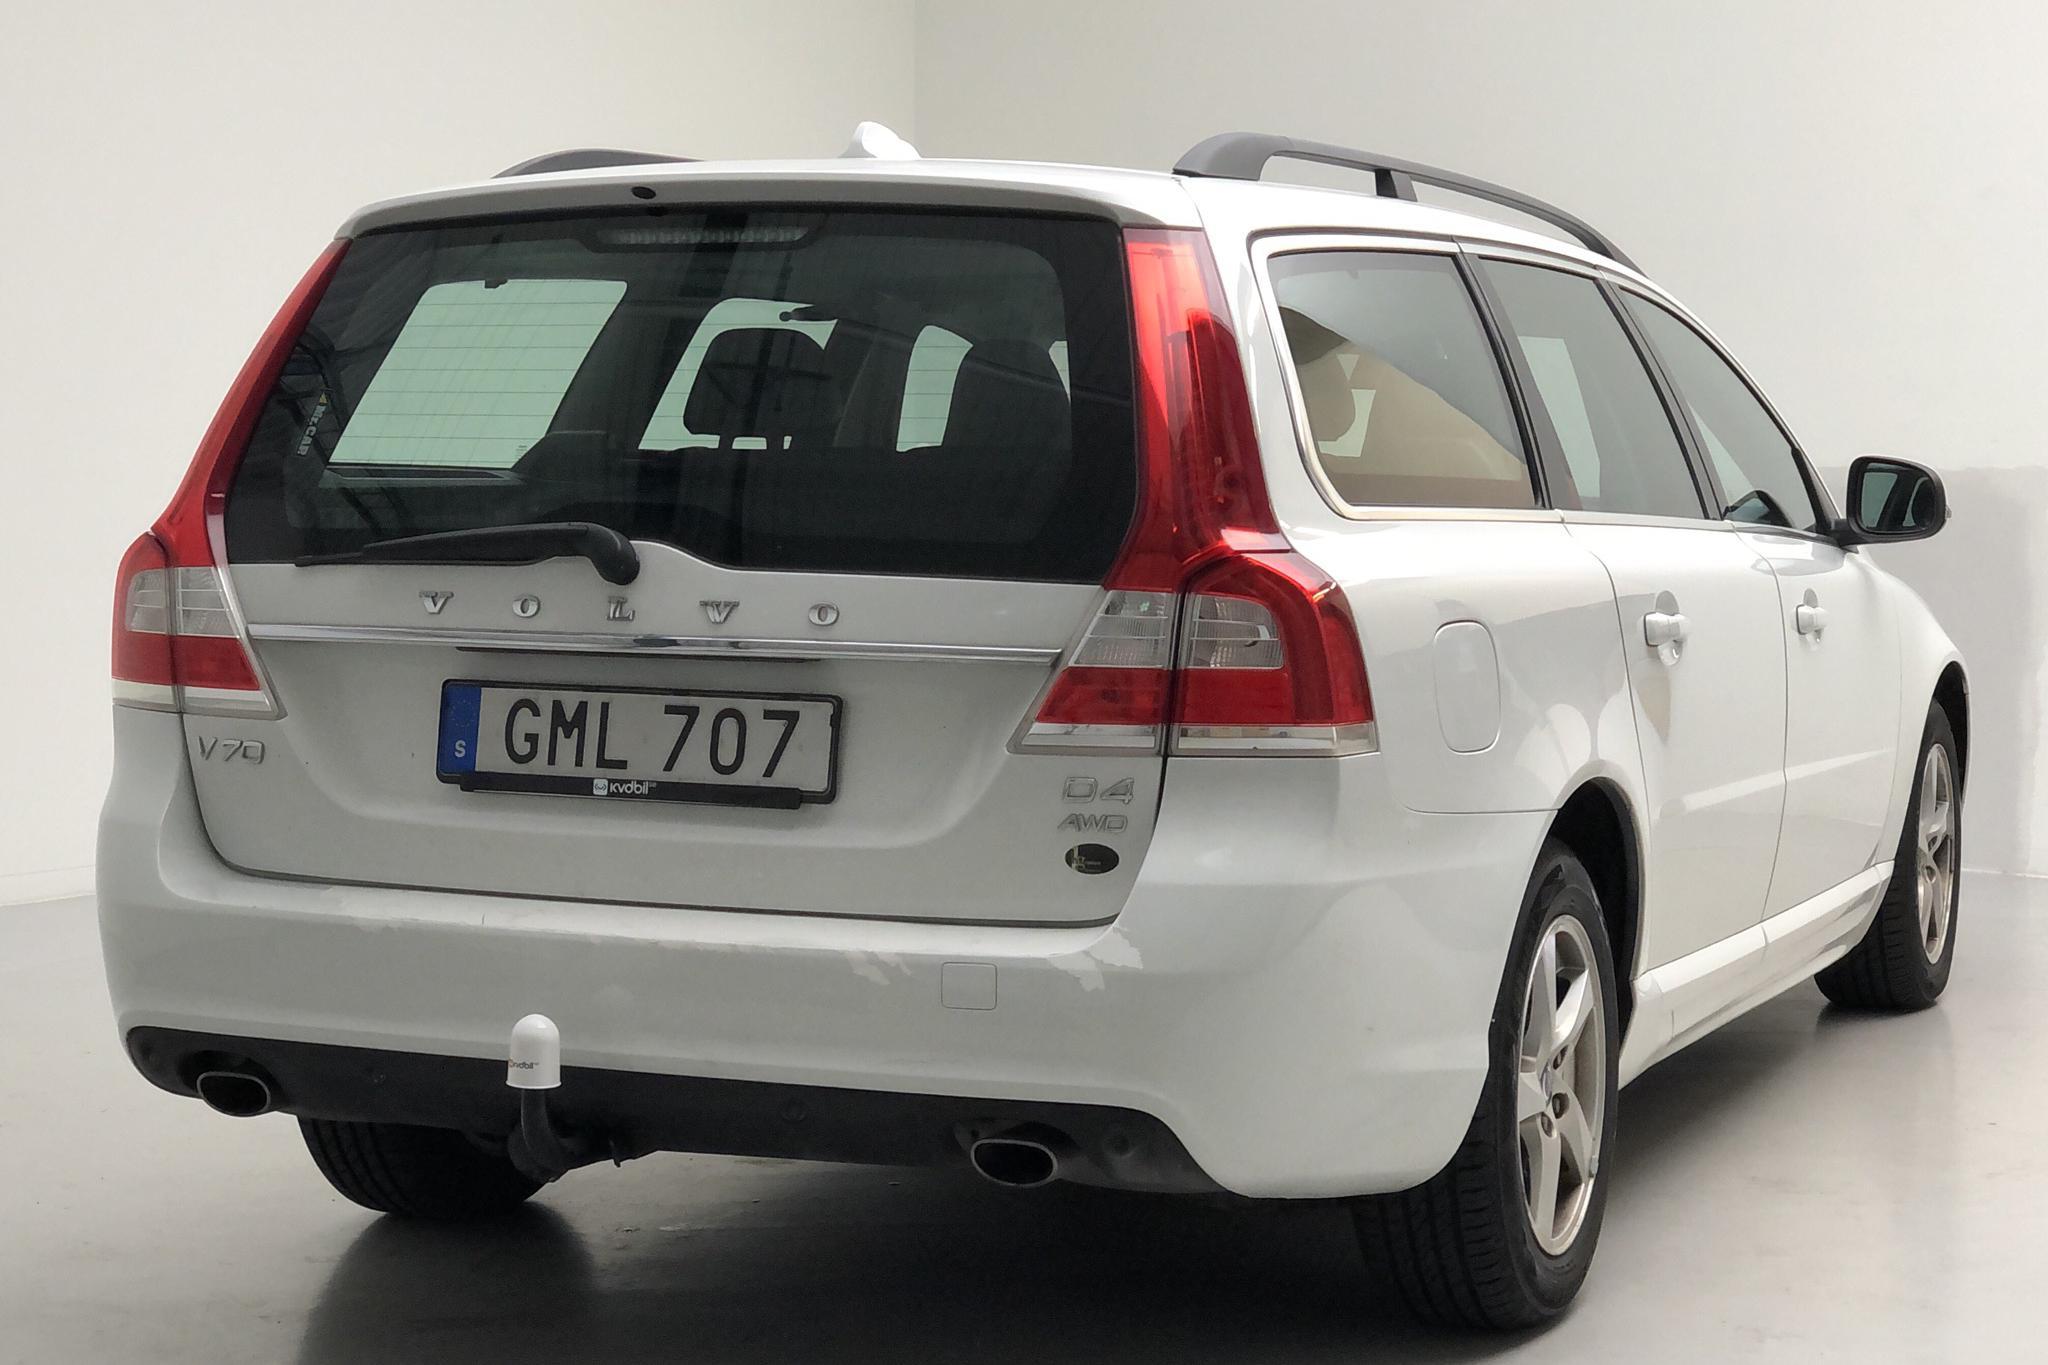 Volvo V70 II D4 AWD (181hk) - 137 730 km - Automatic - white - 2015